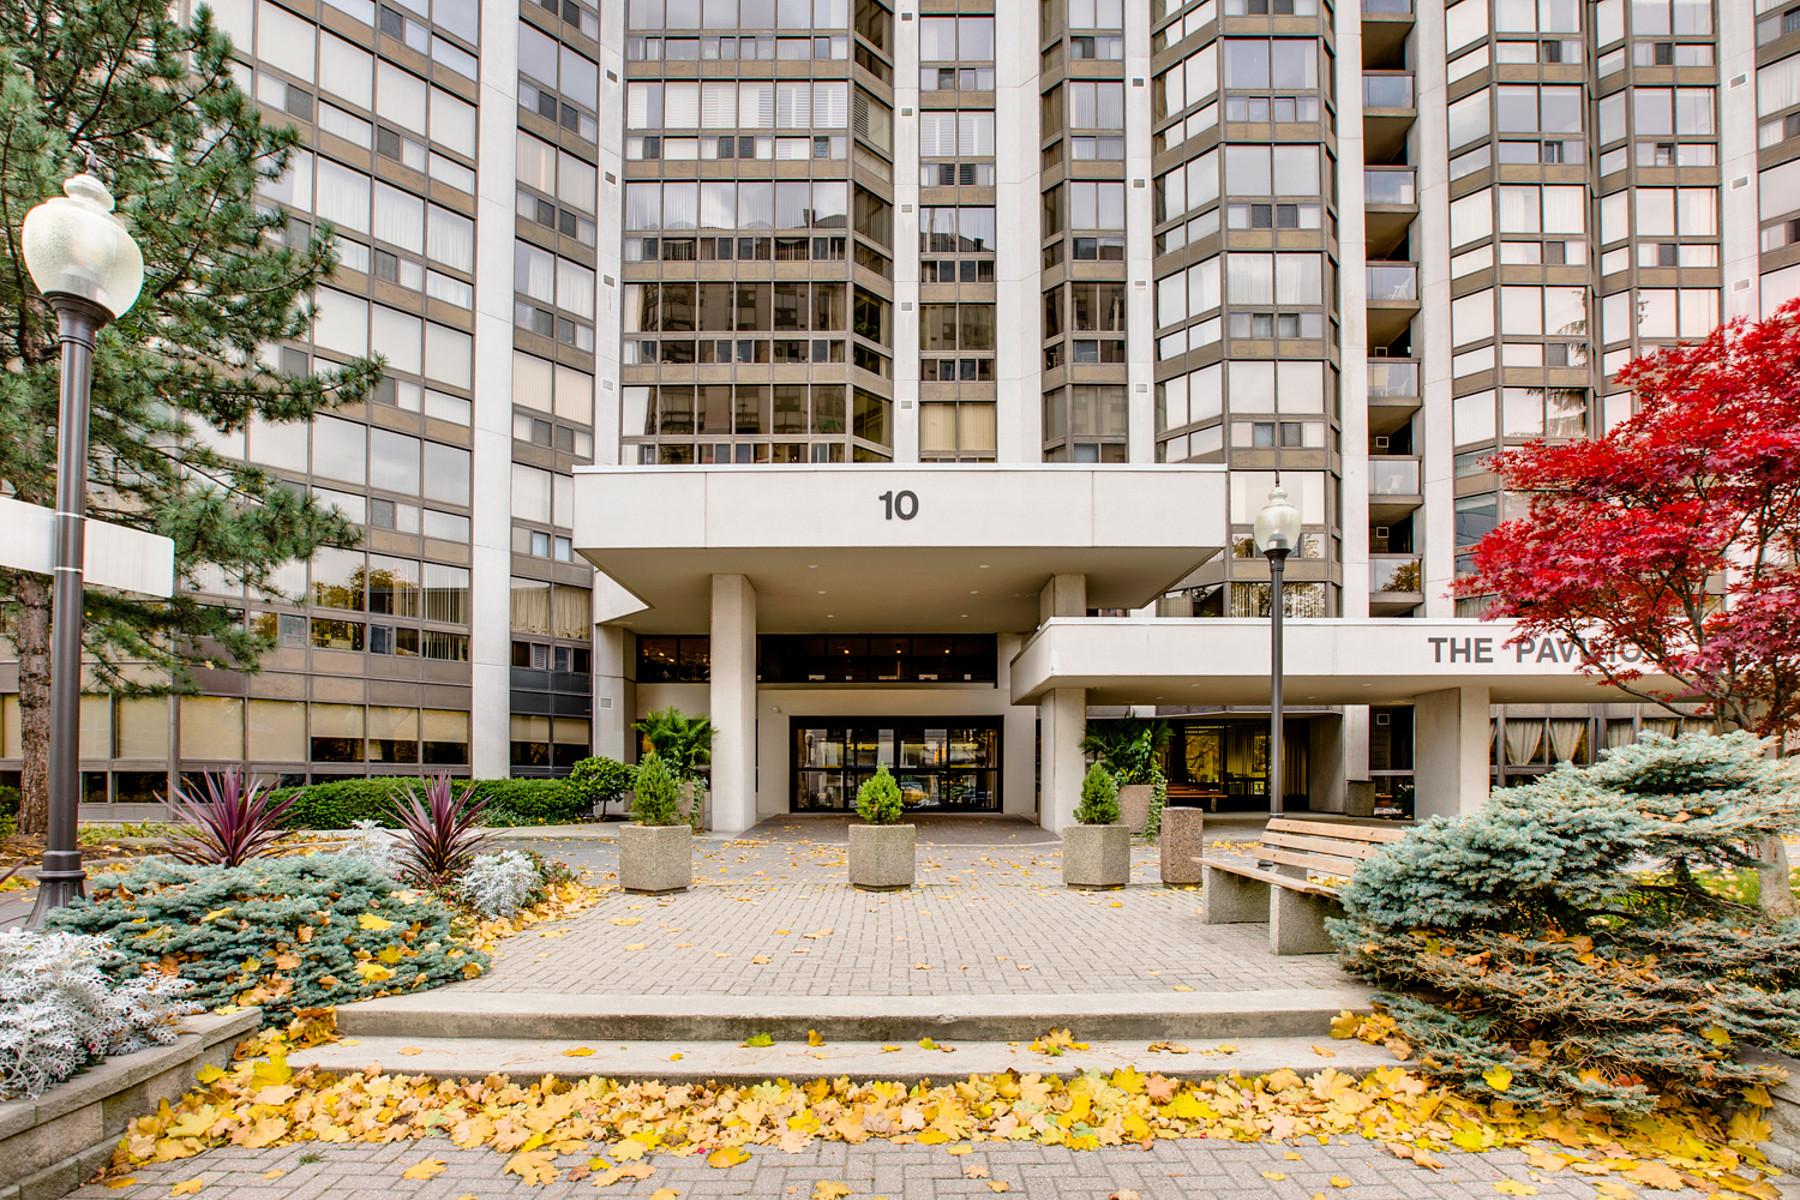 Condomínio para Venda às The Pavilion 10 Kenneth Ave, Toronto, Ontario, M2N6K6 Canadá